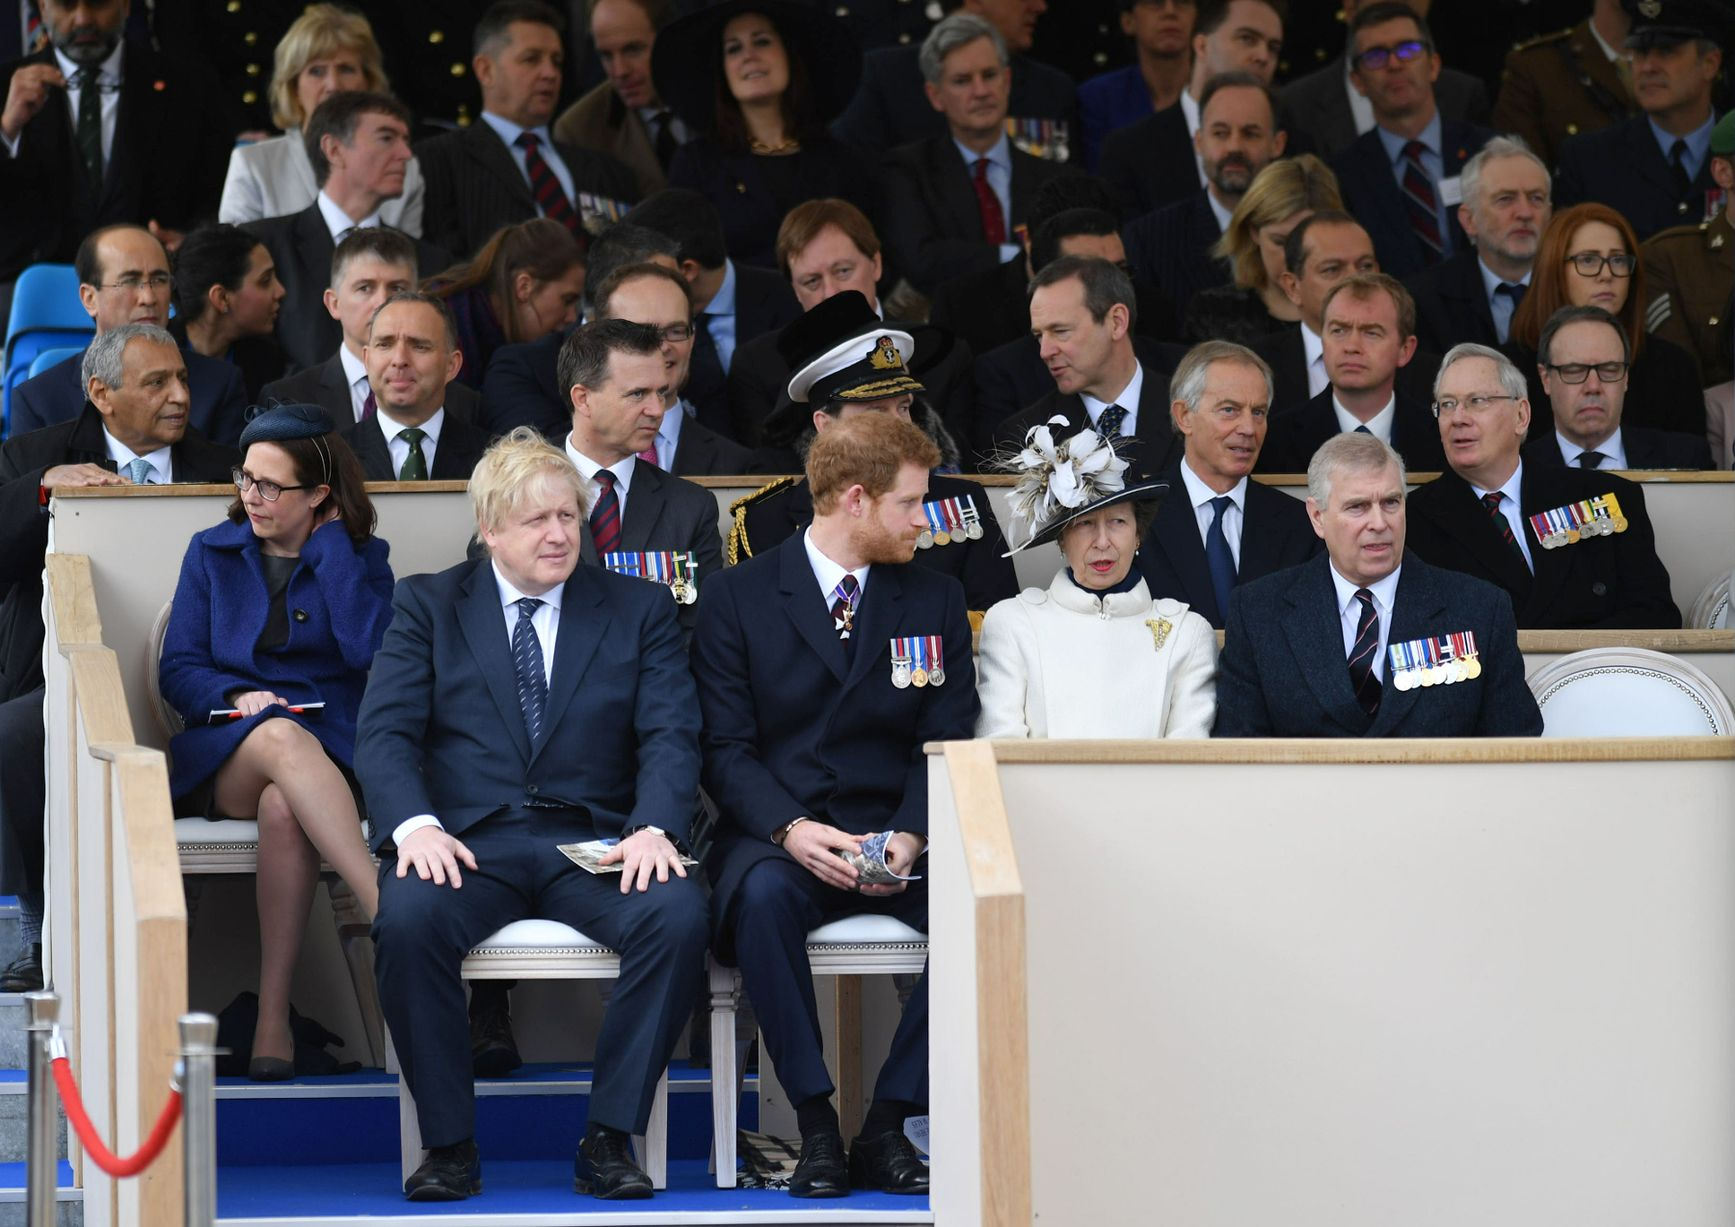 charge u2019d u2019 affaires ameri attends the  u201cafghanistan and iraq